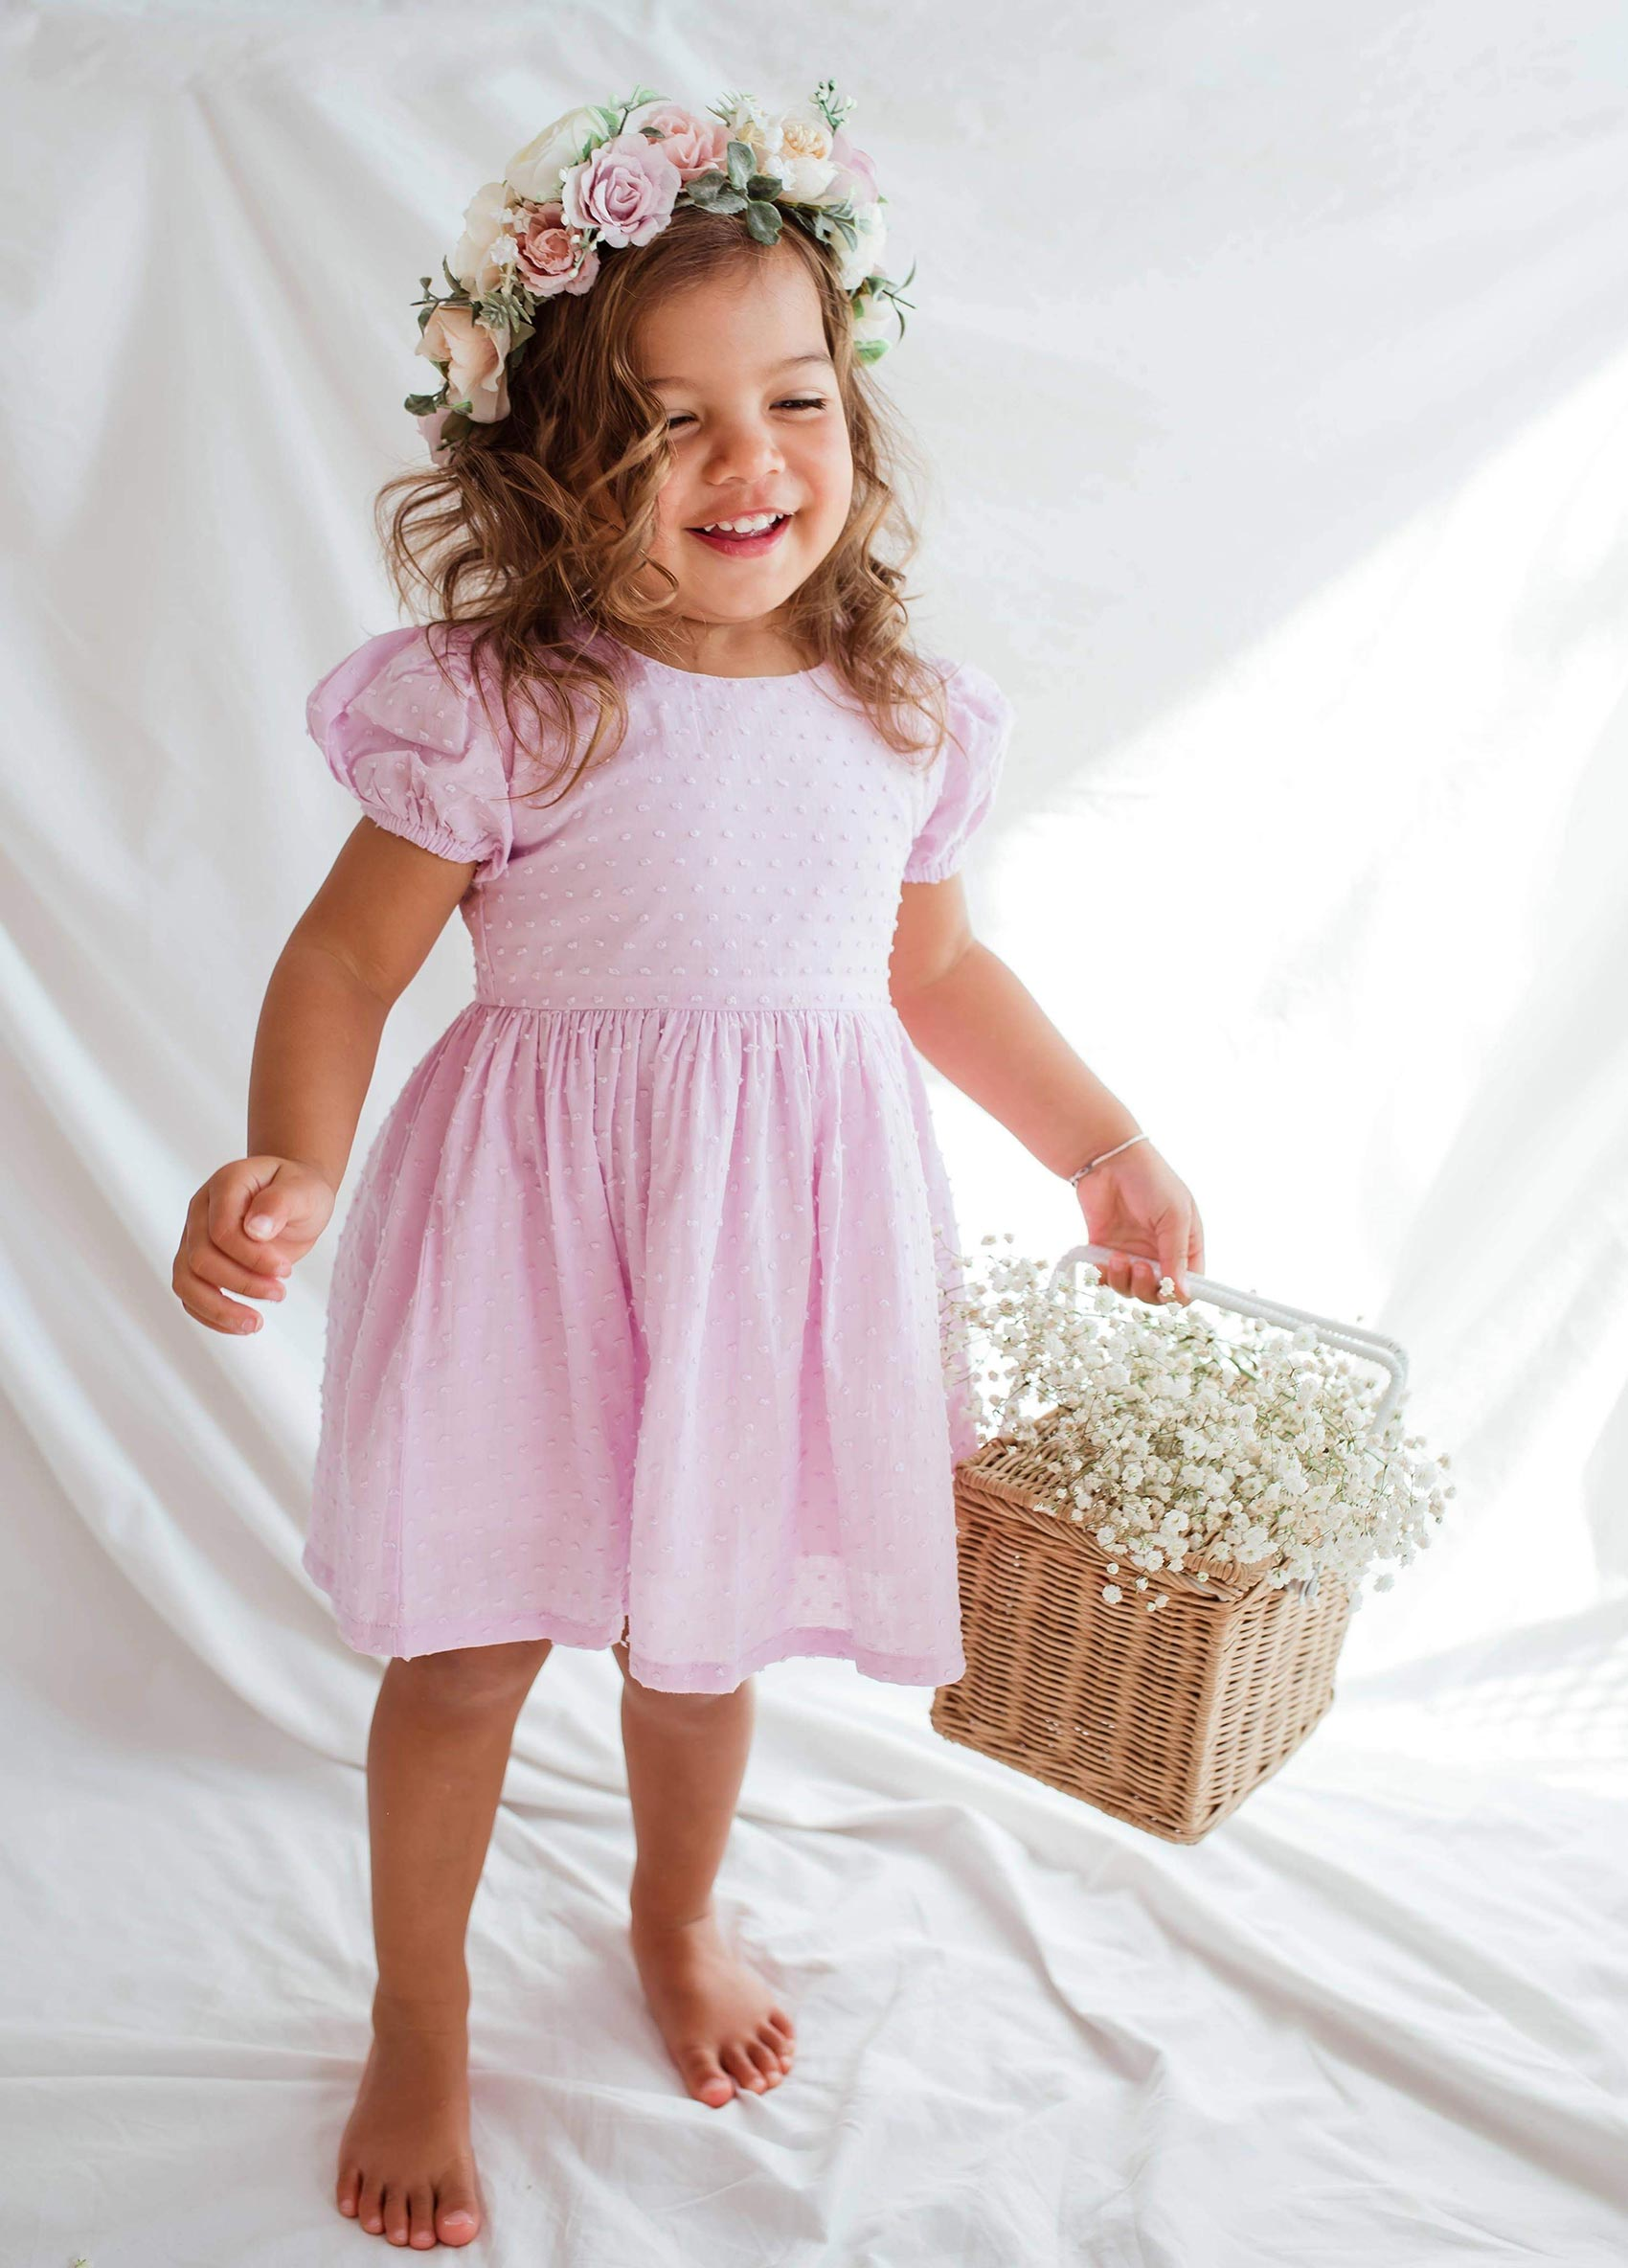 Violet Belle Puffed Sleeve Dress